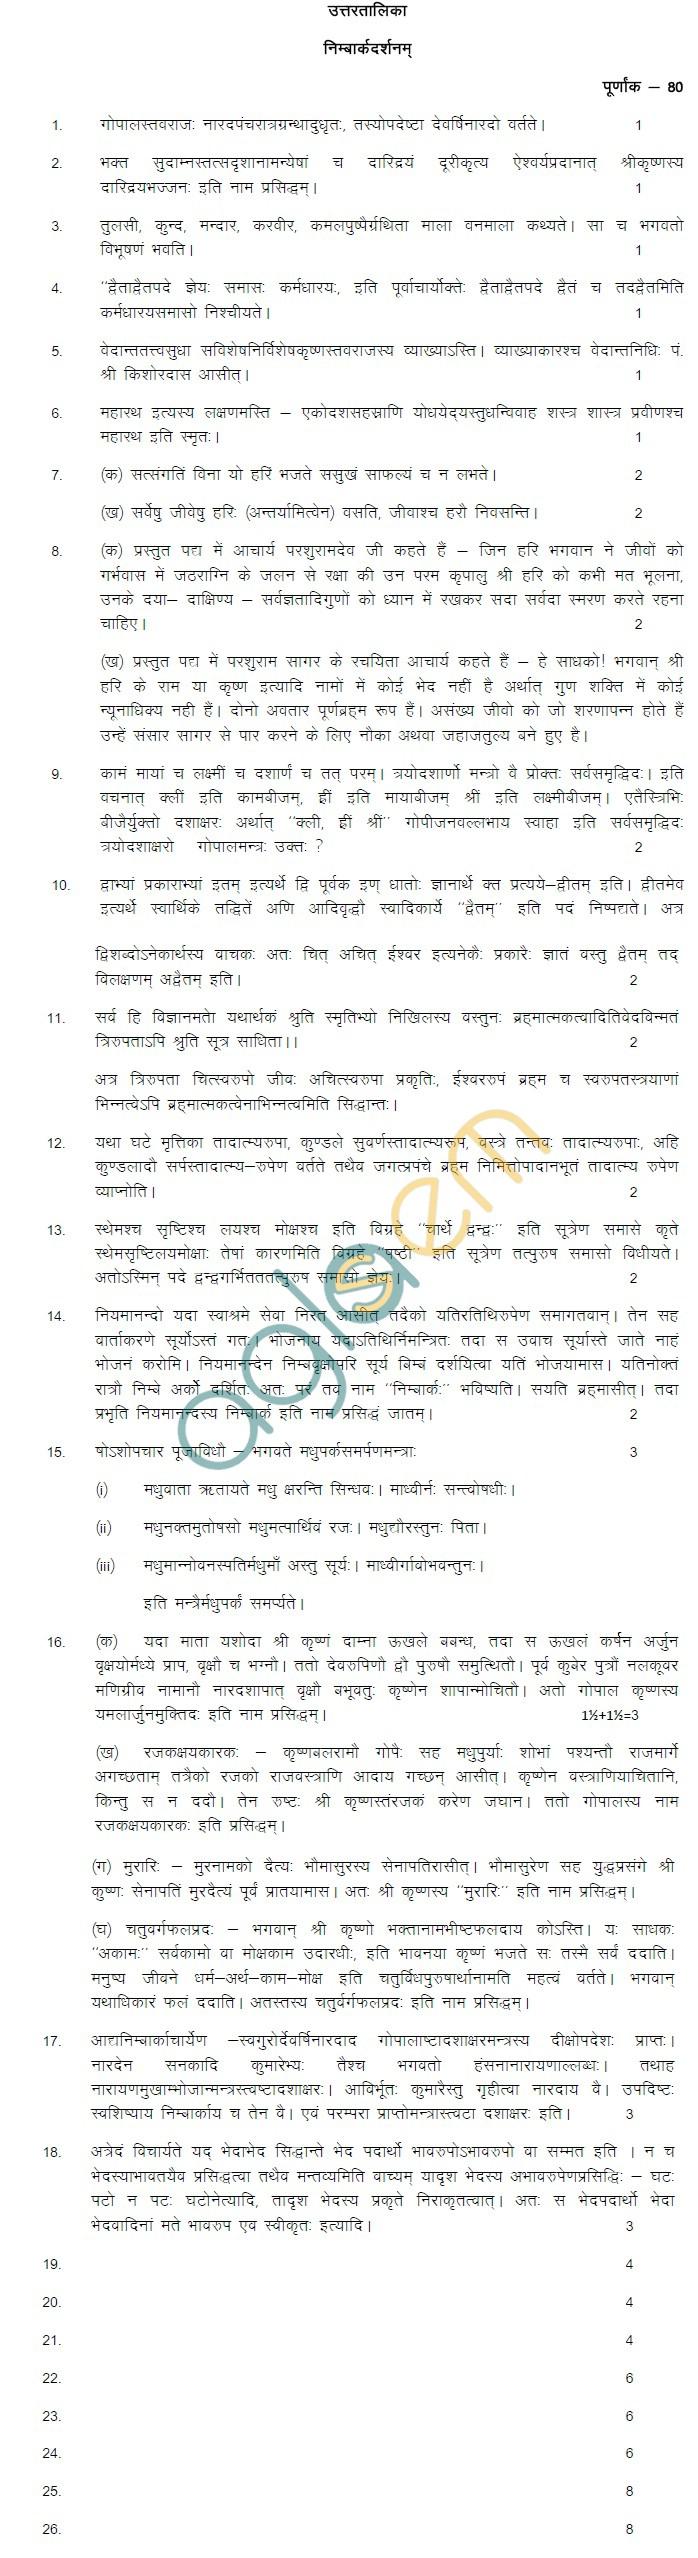 Rajasthan Board Class 12 Nimbark Darshan Model Question Paper